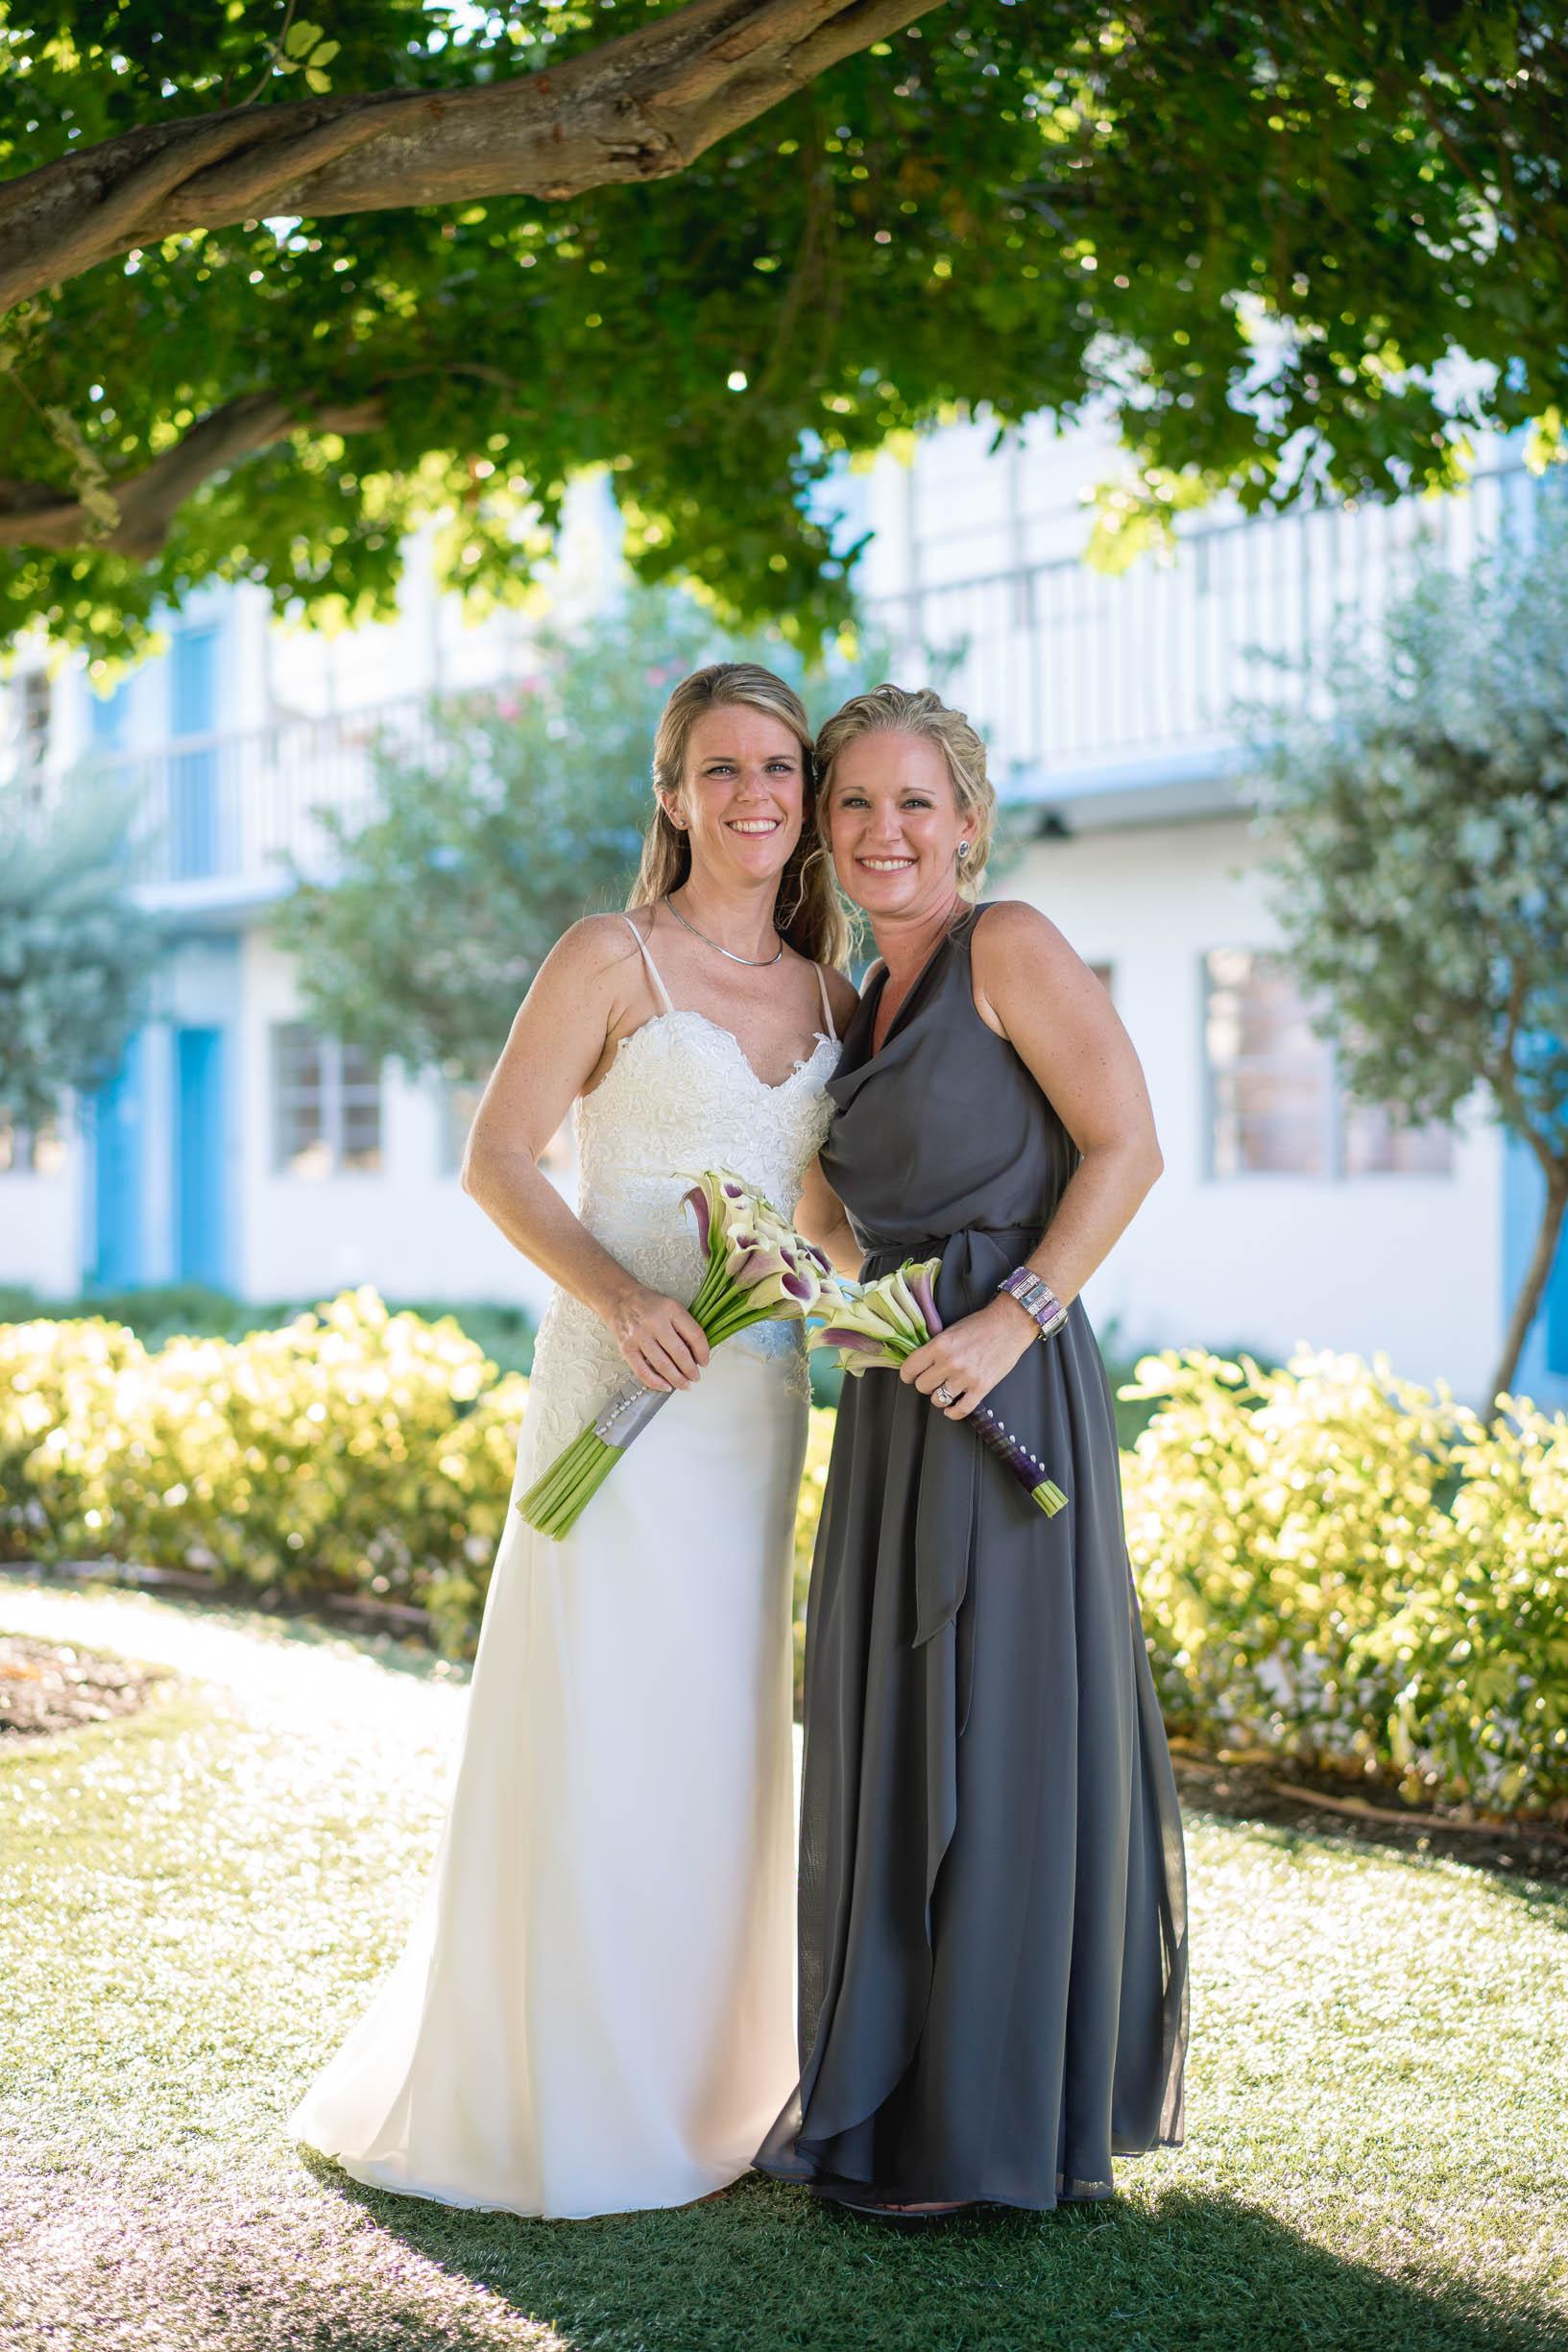 054Portland Wedding Photographer timothy capp.jpg